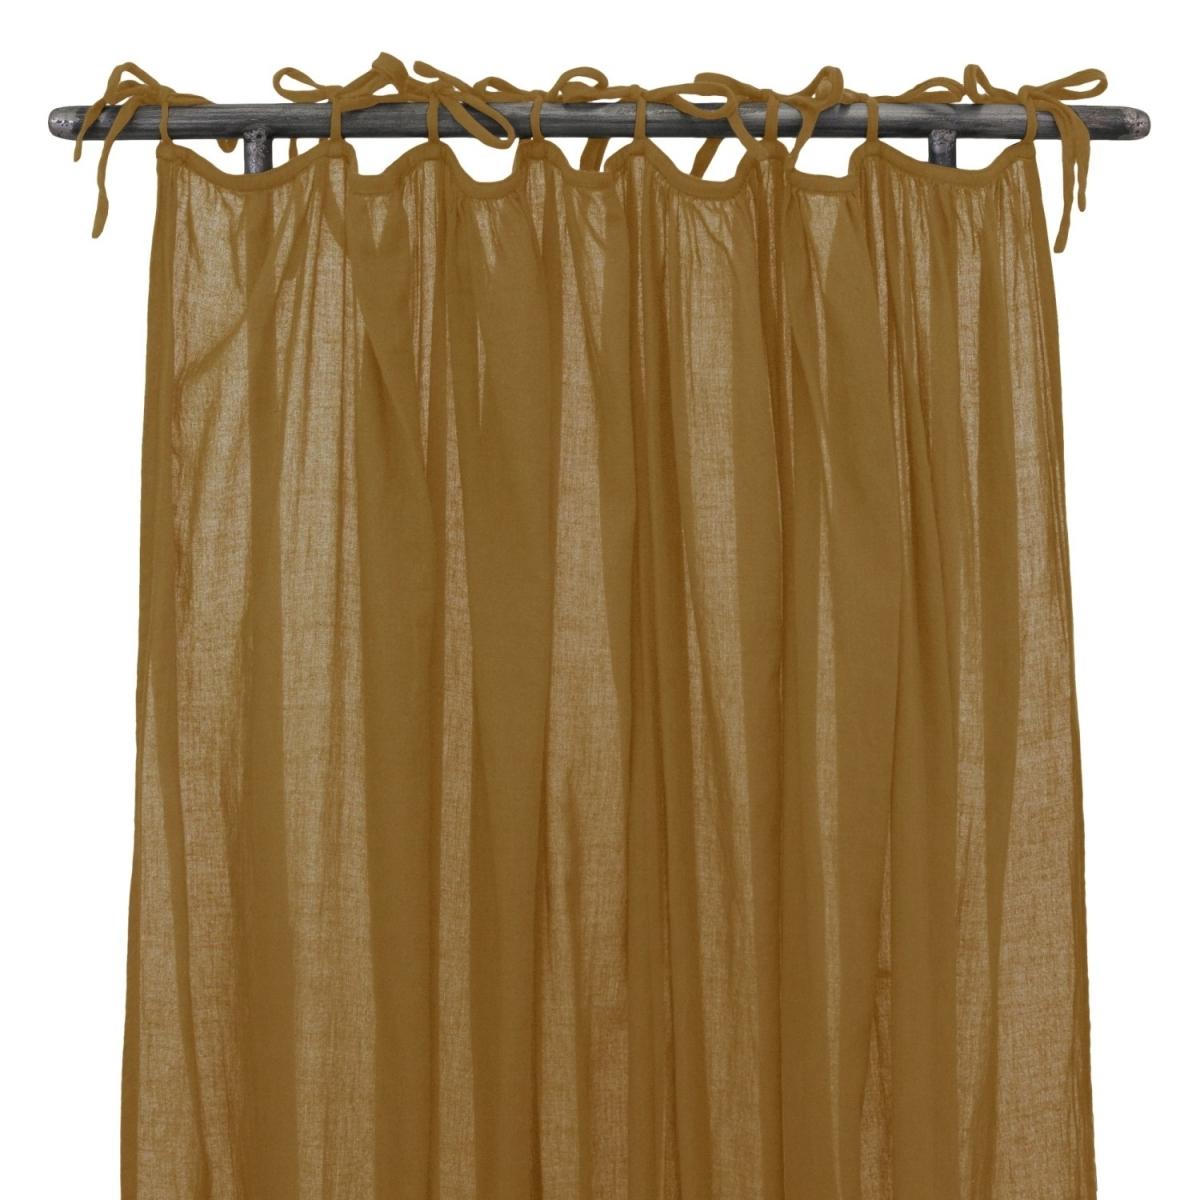 Gathered Curtain gold - Numero 74